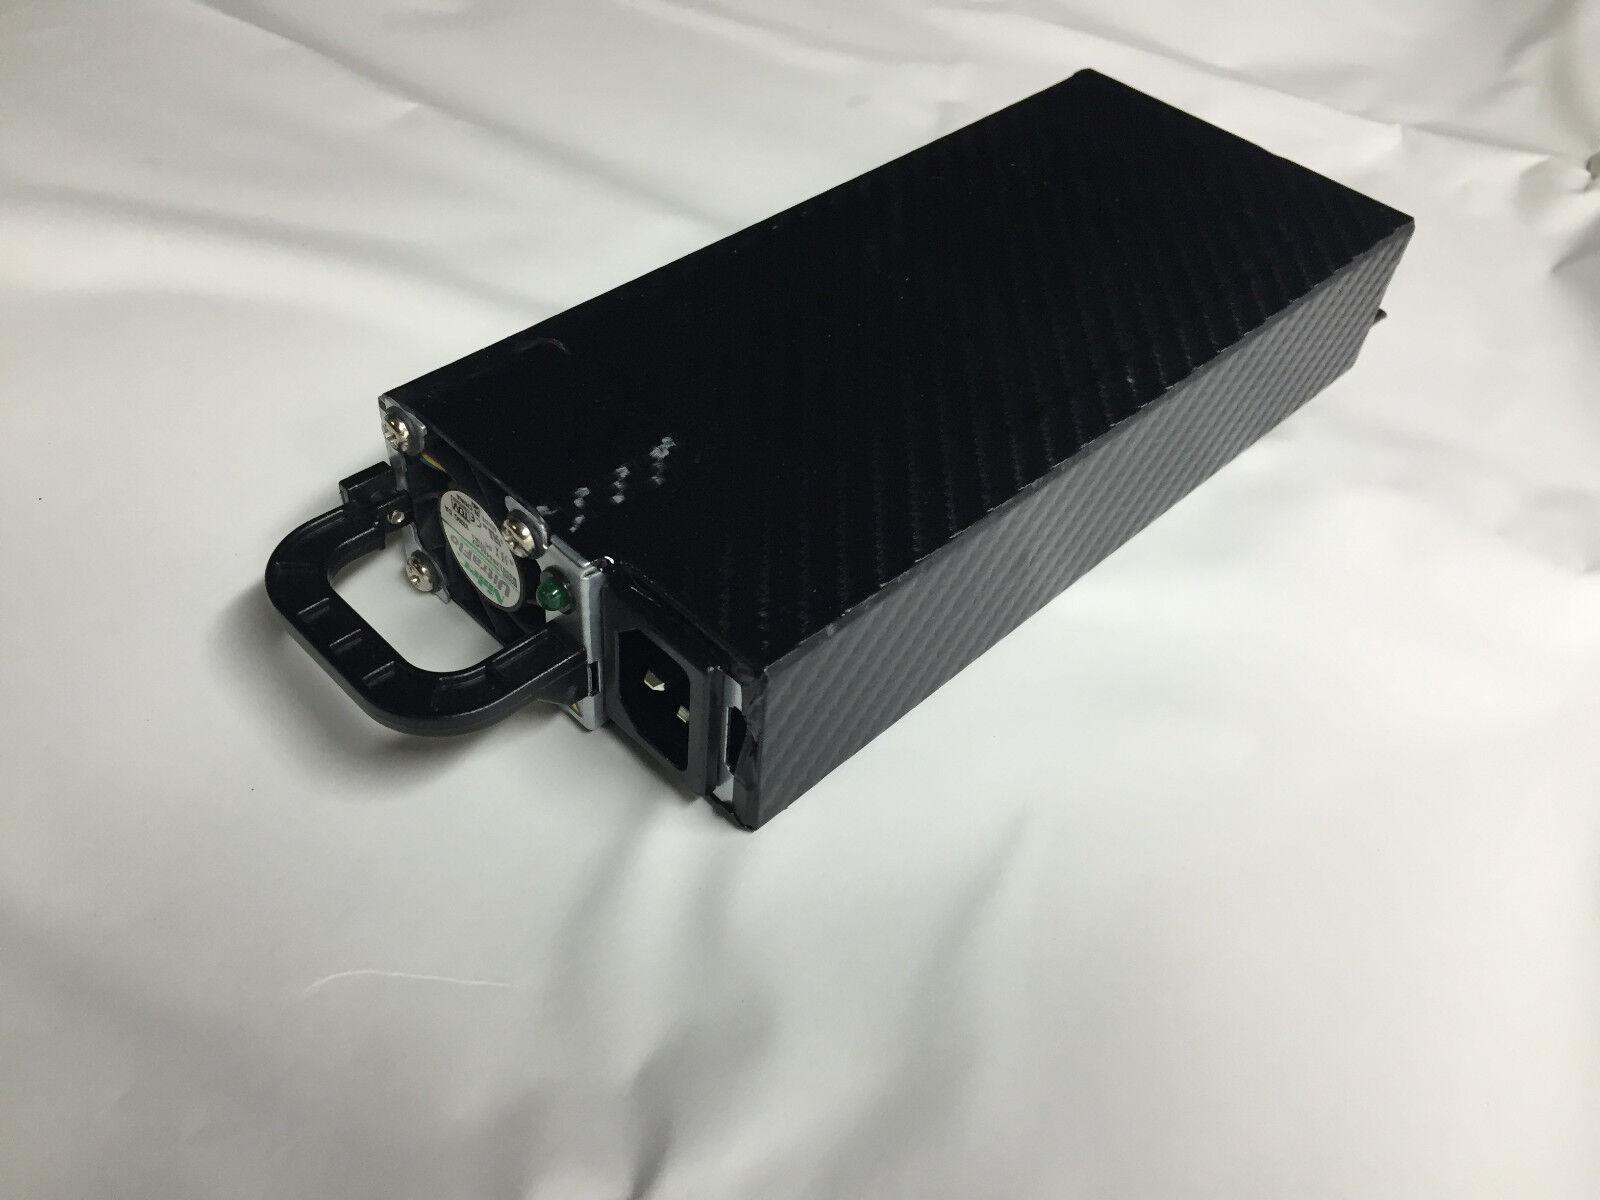 ICharger 75 AMP 900 WATT 12 DC VOLT VOLT VOLT Power Supply W  USB  FPV iCharger 406 4010 d240c9